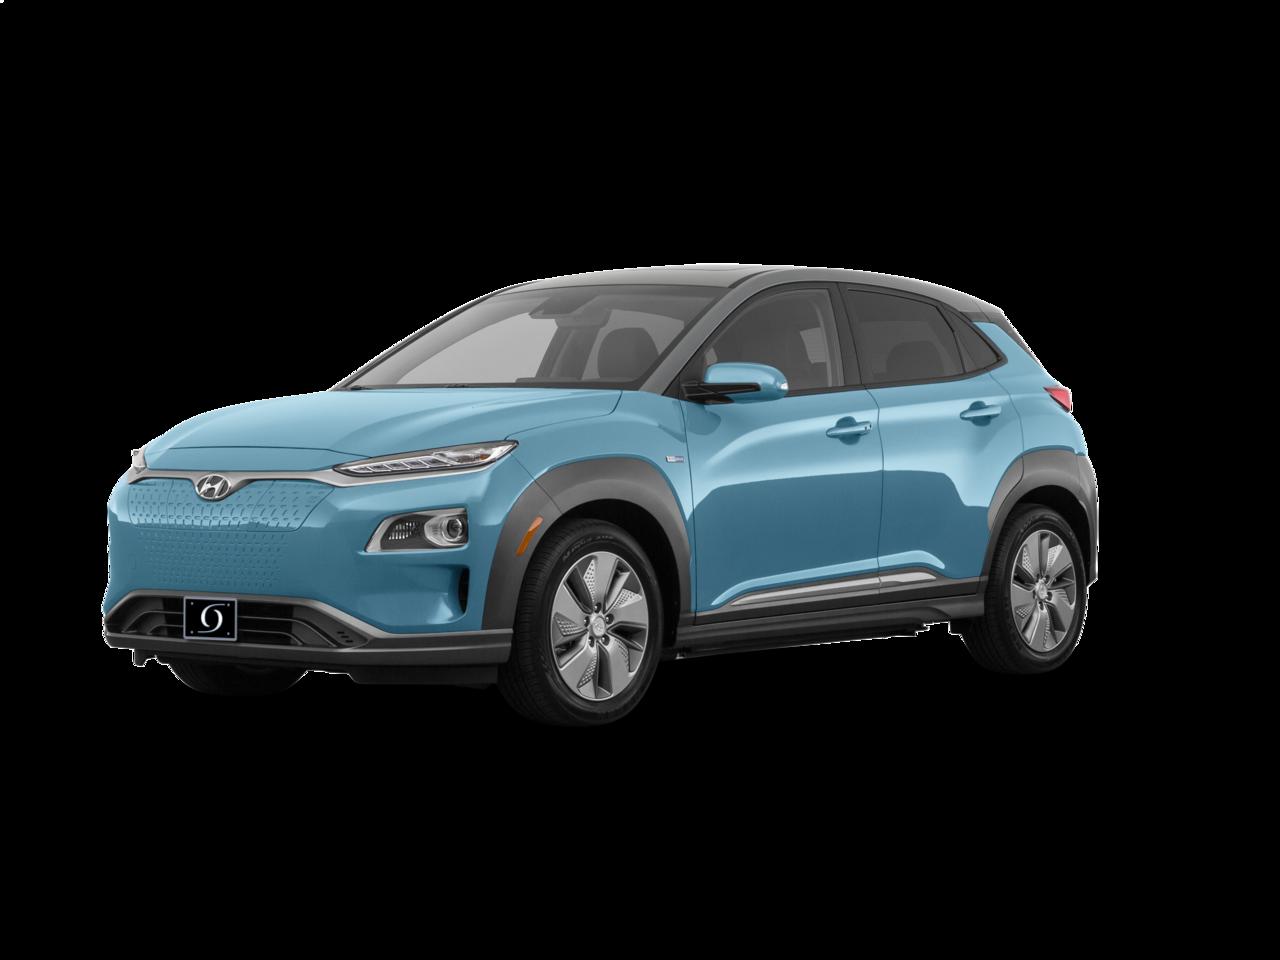 2020 Hyundai Kona Electric Ultimate 4dr SUV (electric DD) Ceramic Blue